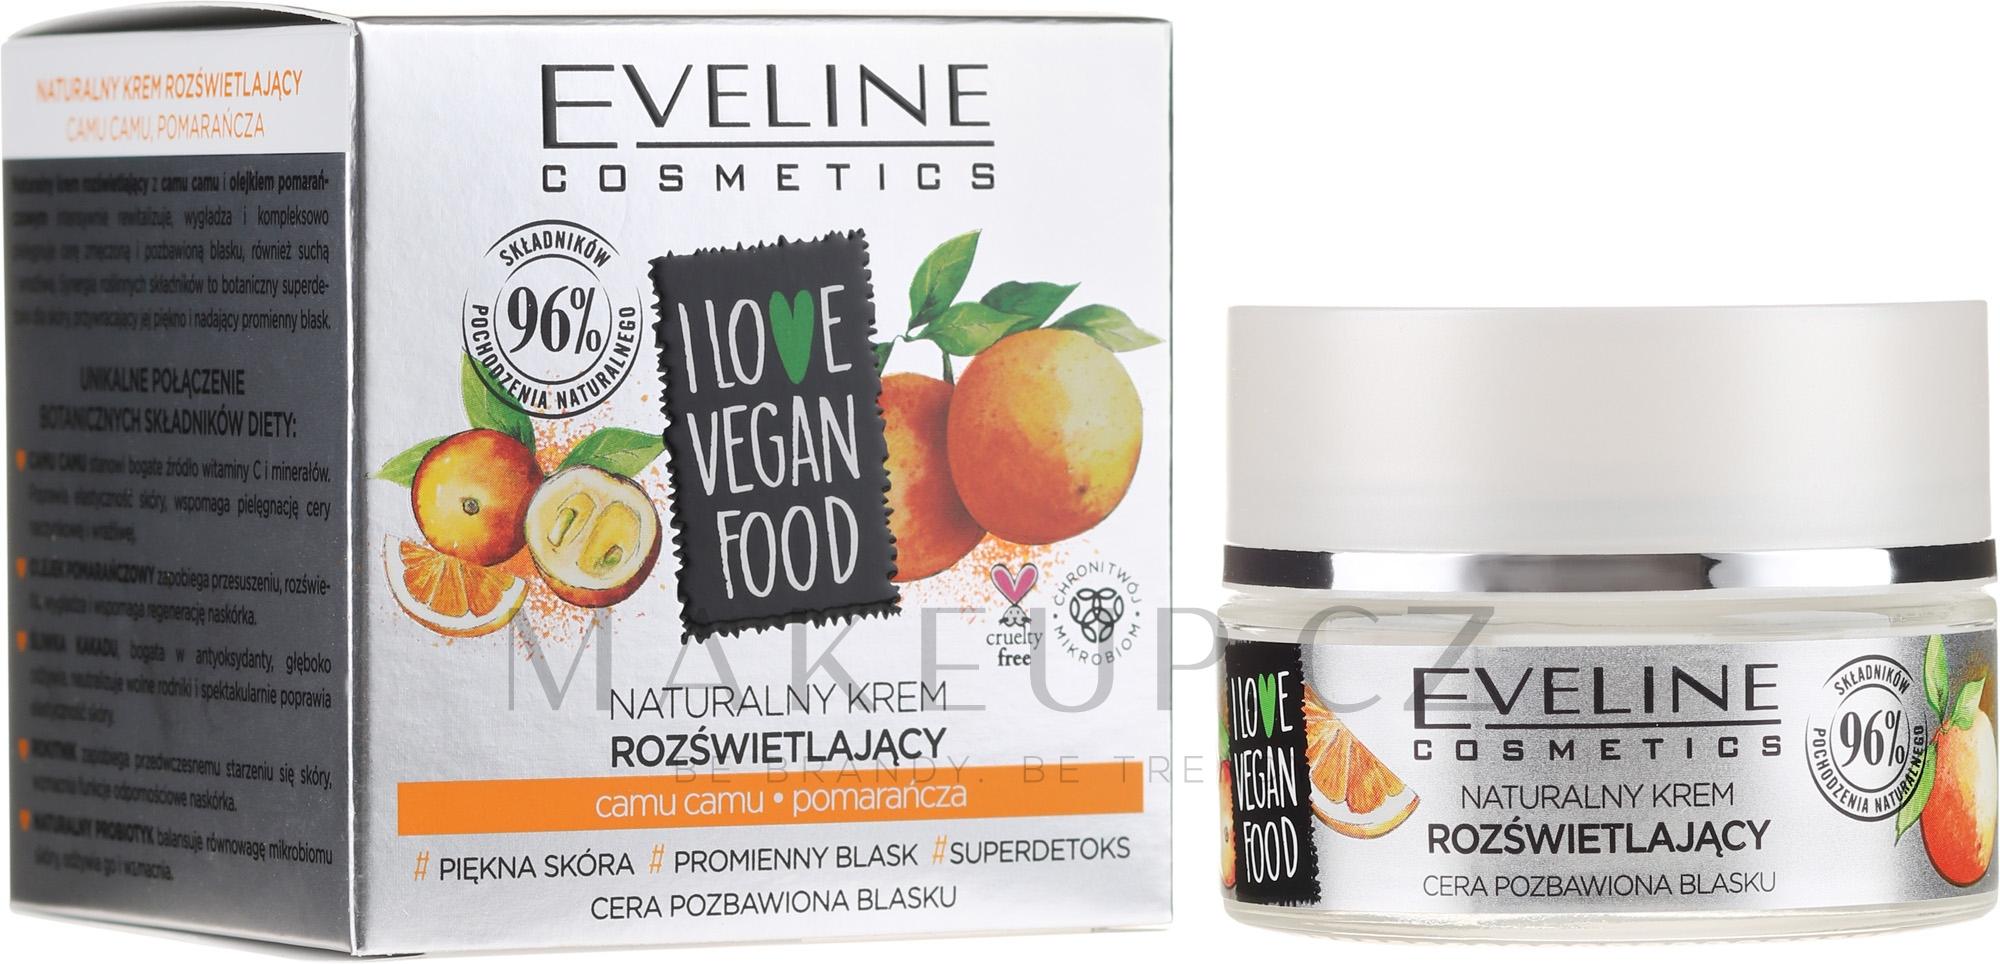 Krém na obličej Kamu Kamu a pomeranč - Eveline I Love Vegan Food Face Kream — foto 50 ml